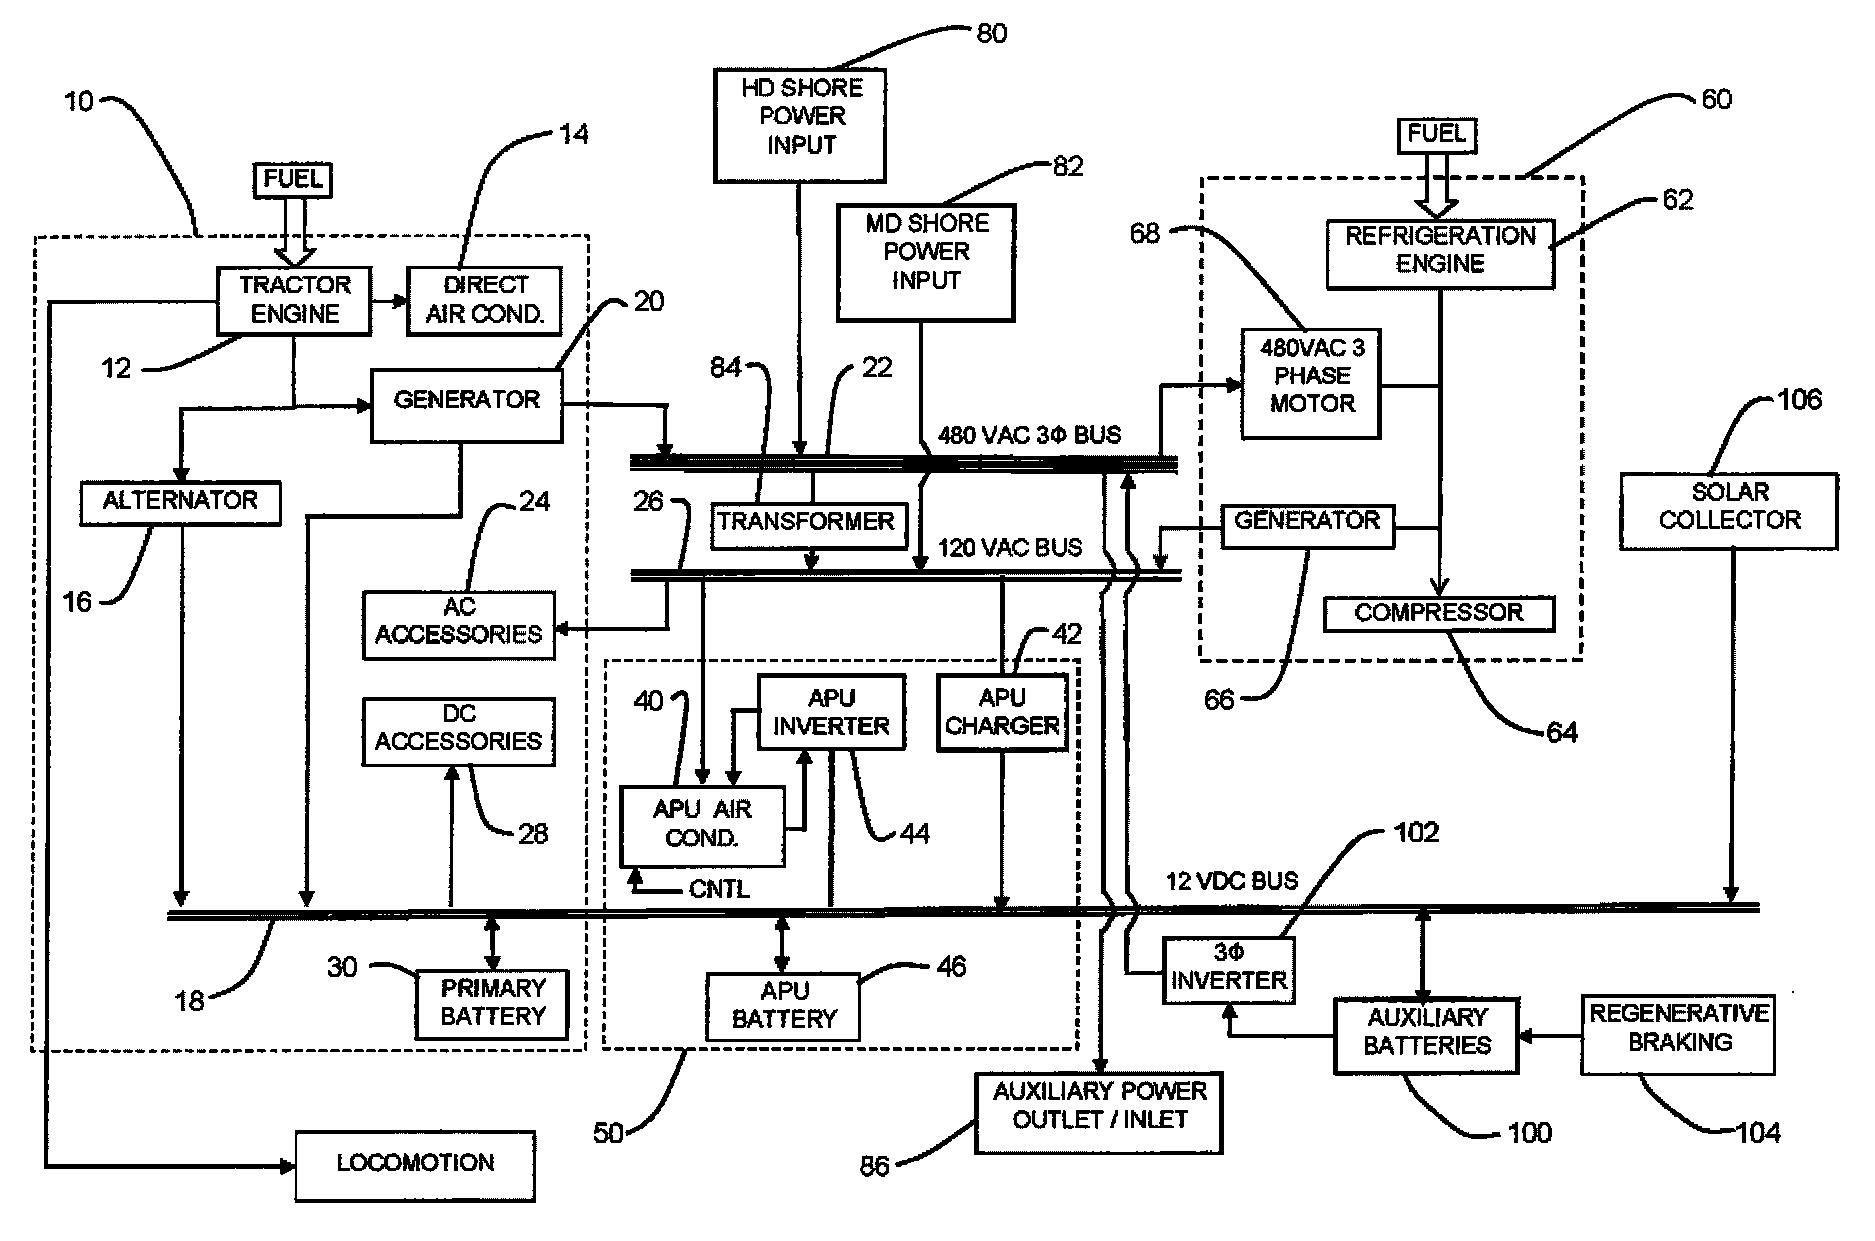 1970 dodge truck wiring diagram refrigerated truck wiring diagram